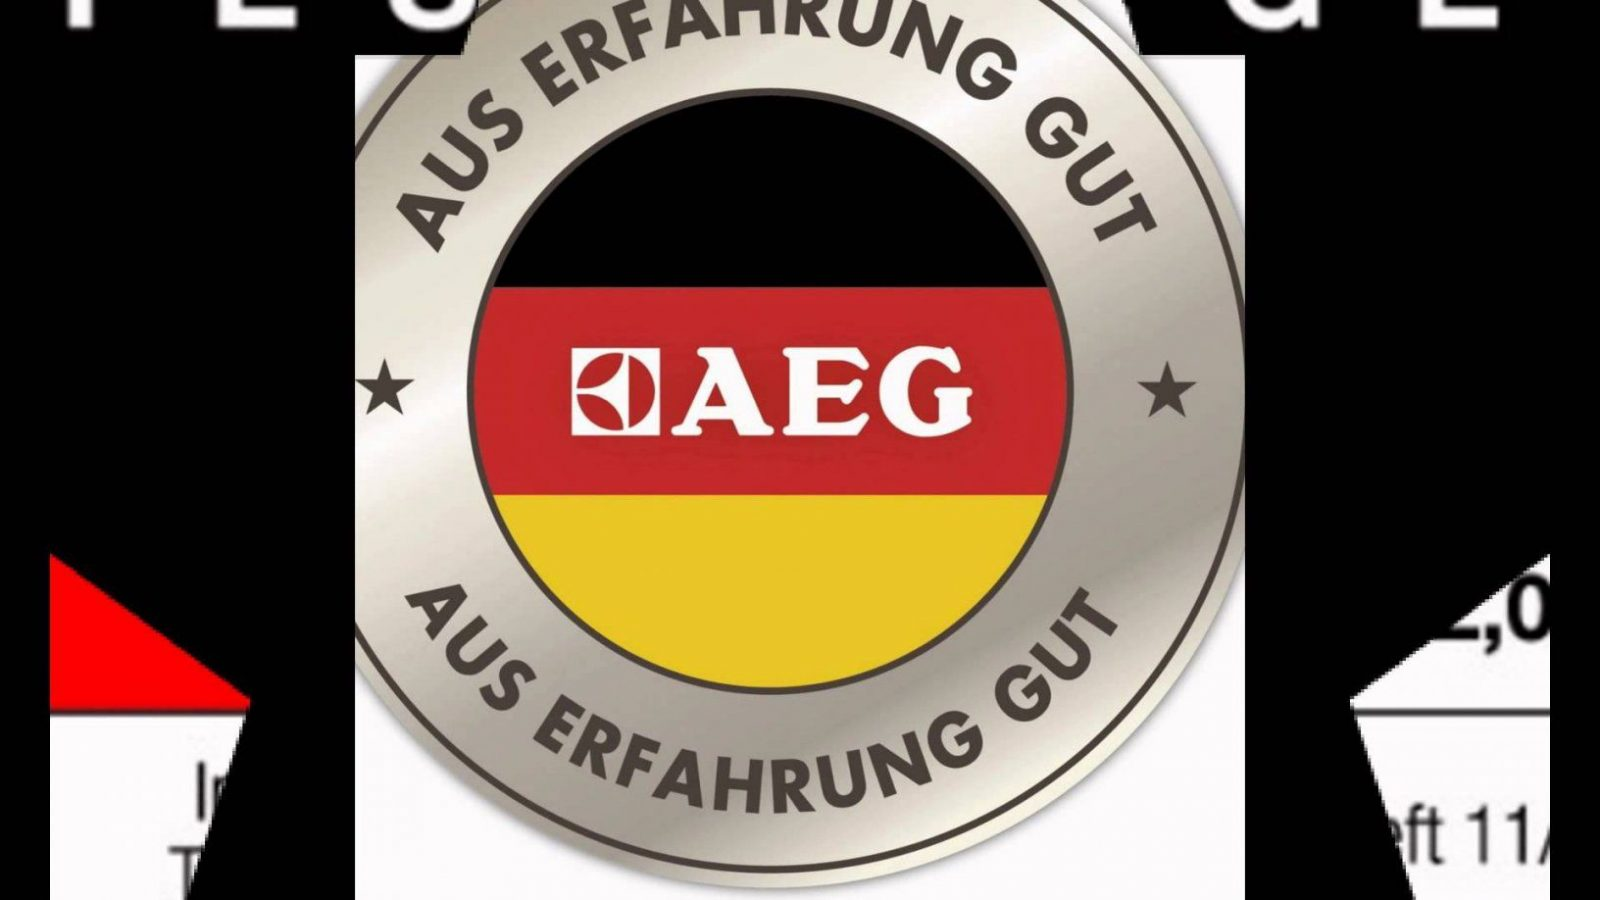 Aeg Eco Li 60 Ultrapower Ag 5012 Handstaubsauger  Youtube von Aeg Eco Li 60 Ultrapower Ag 5012 Test Bild